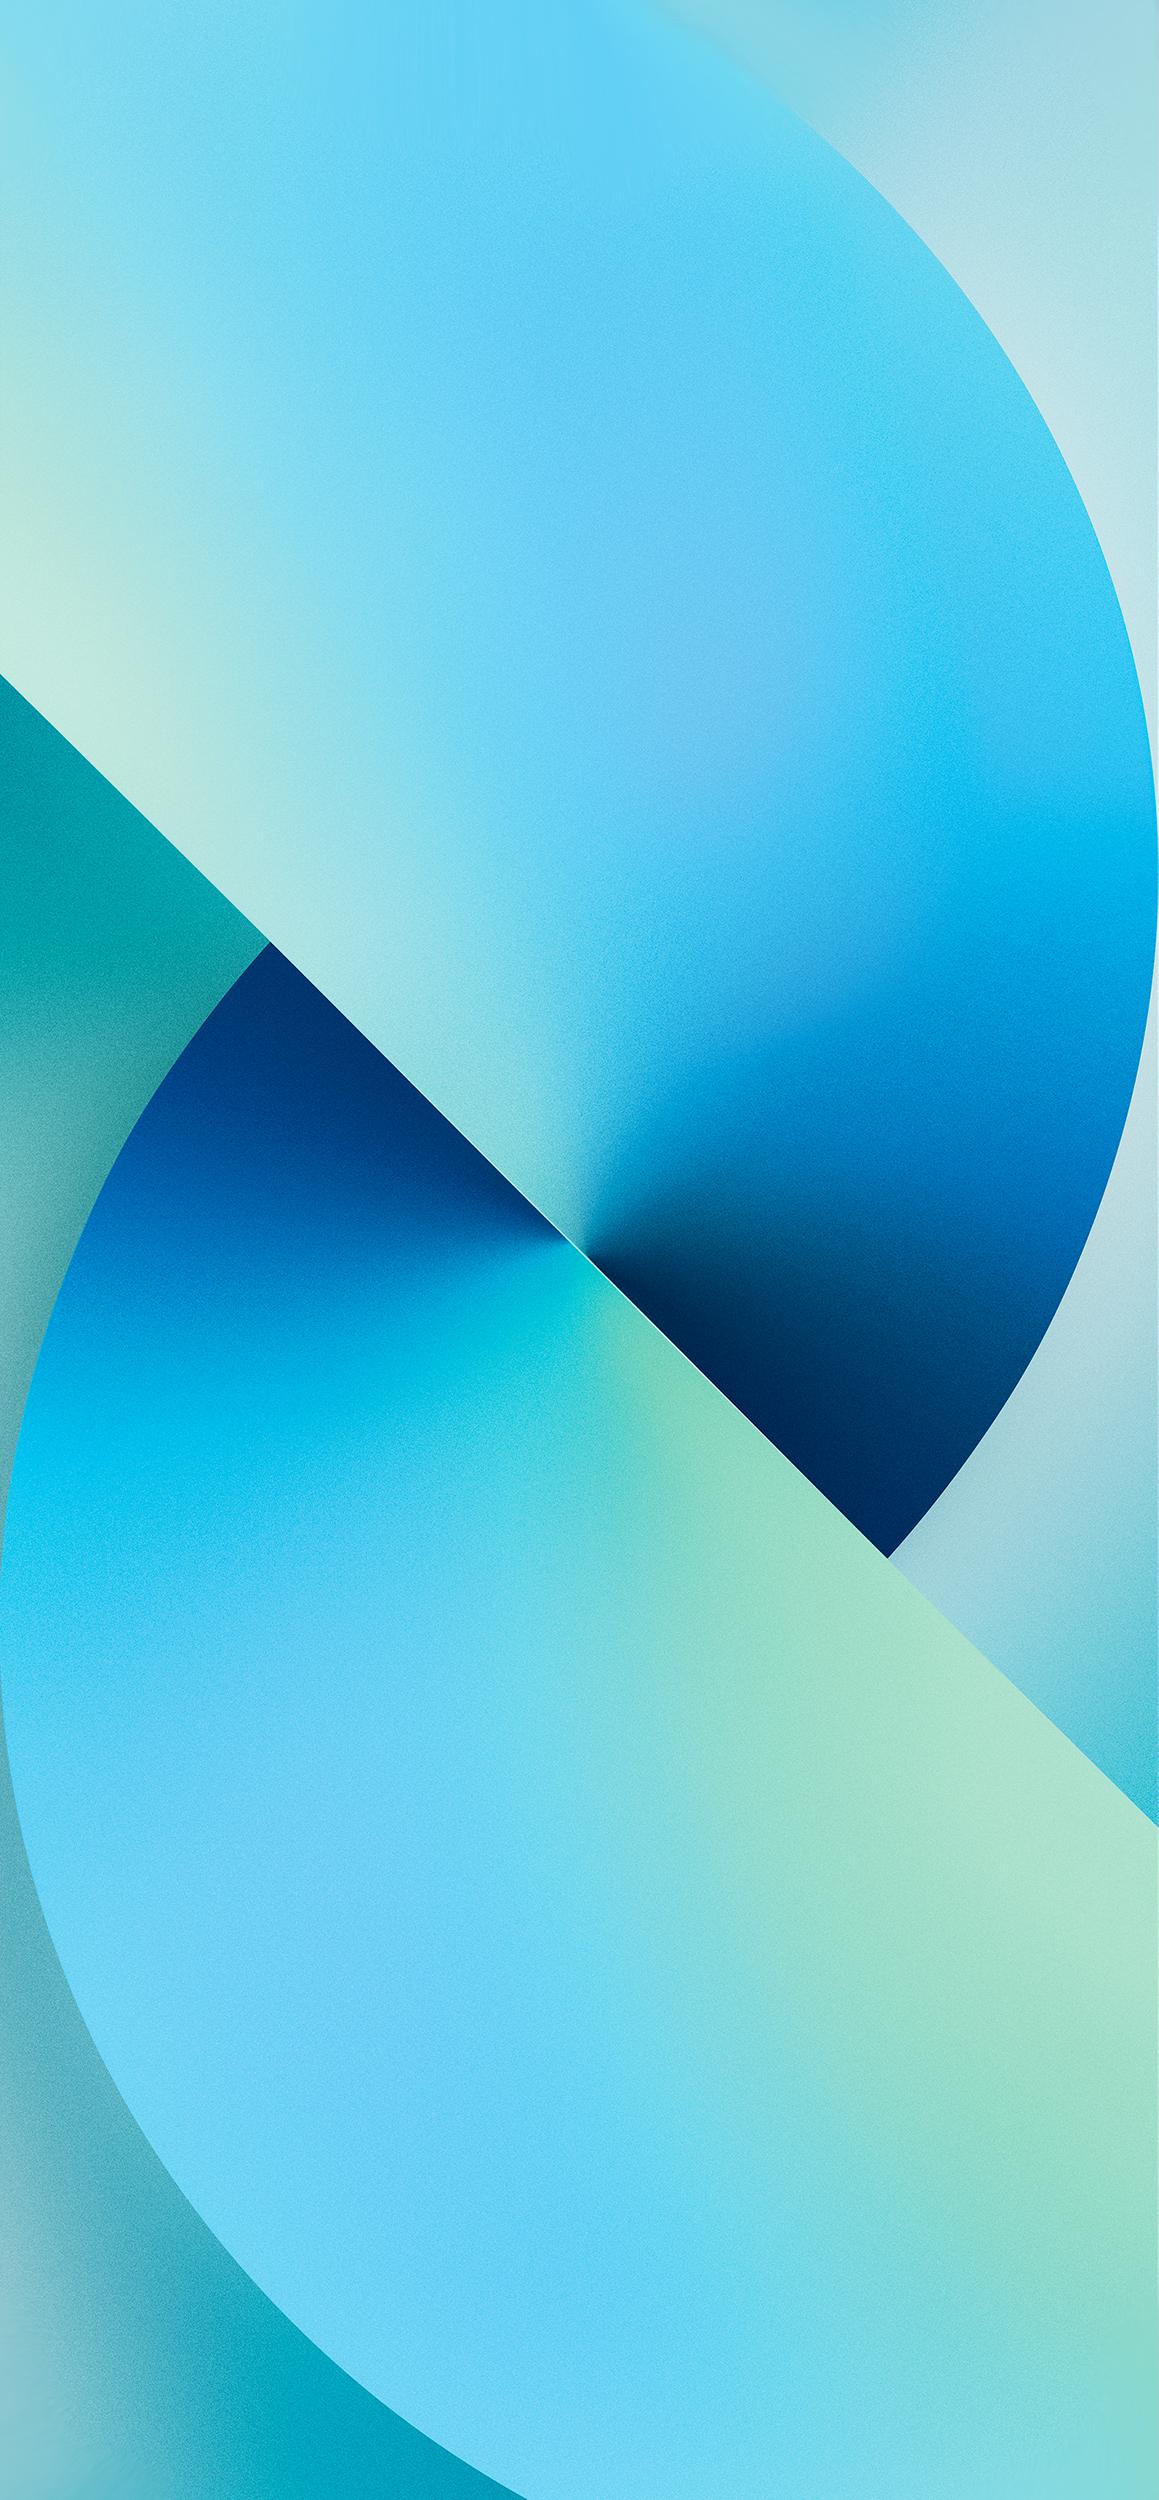 IPhone 13 Blue Wallpaper Download